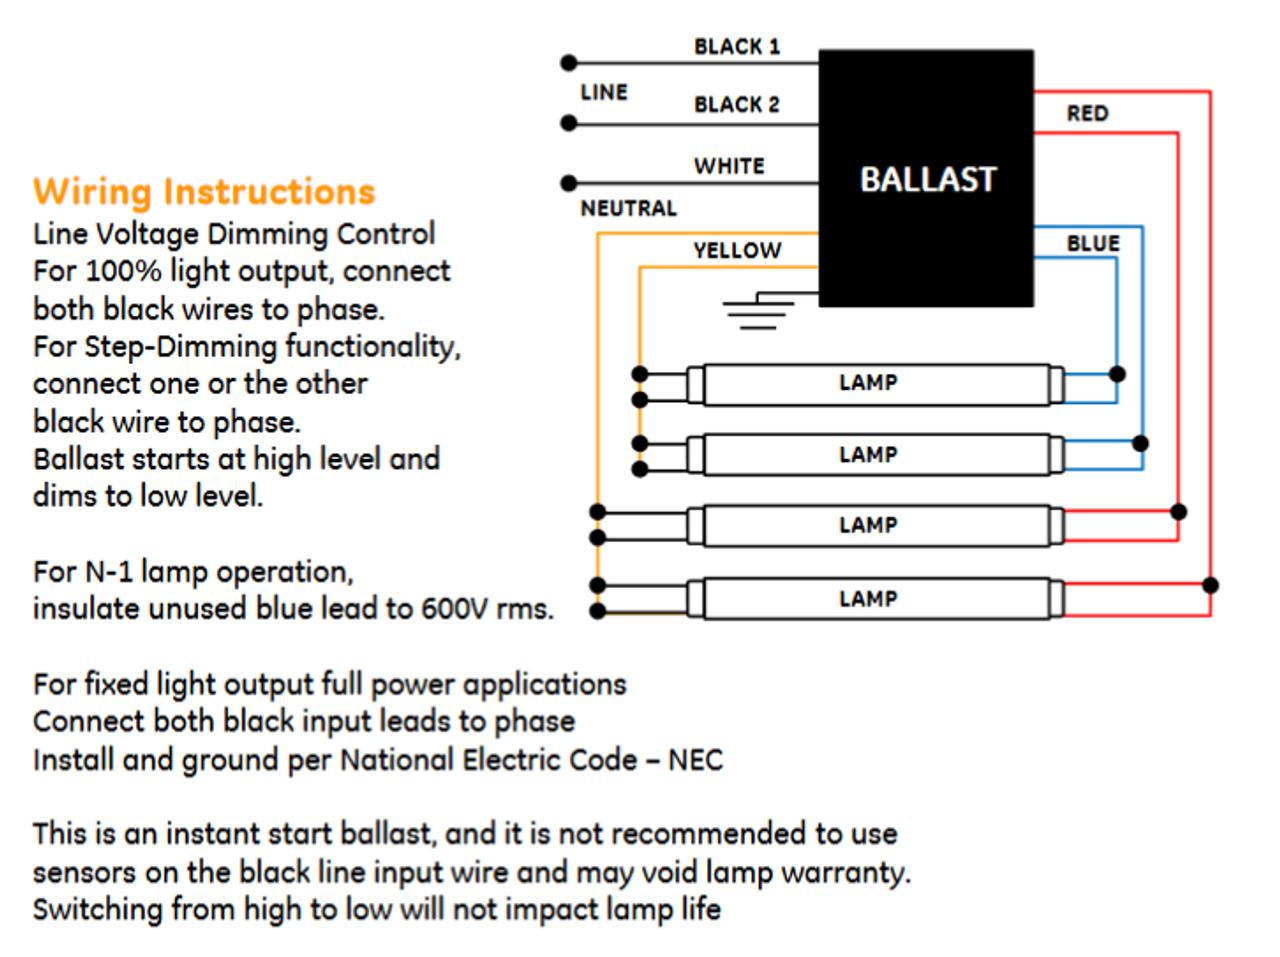 ge432max90 s60 ge 73229 ultramax t8 bi level dimming ballast rh ballastshop com